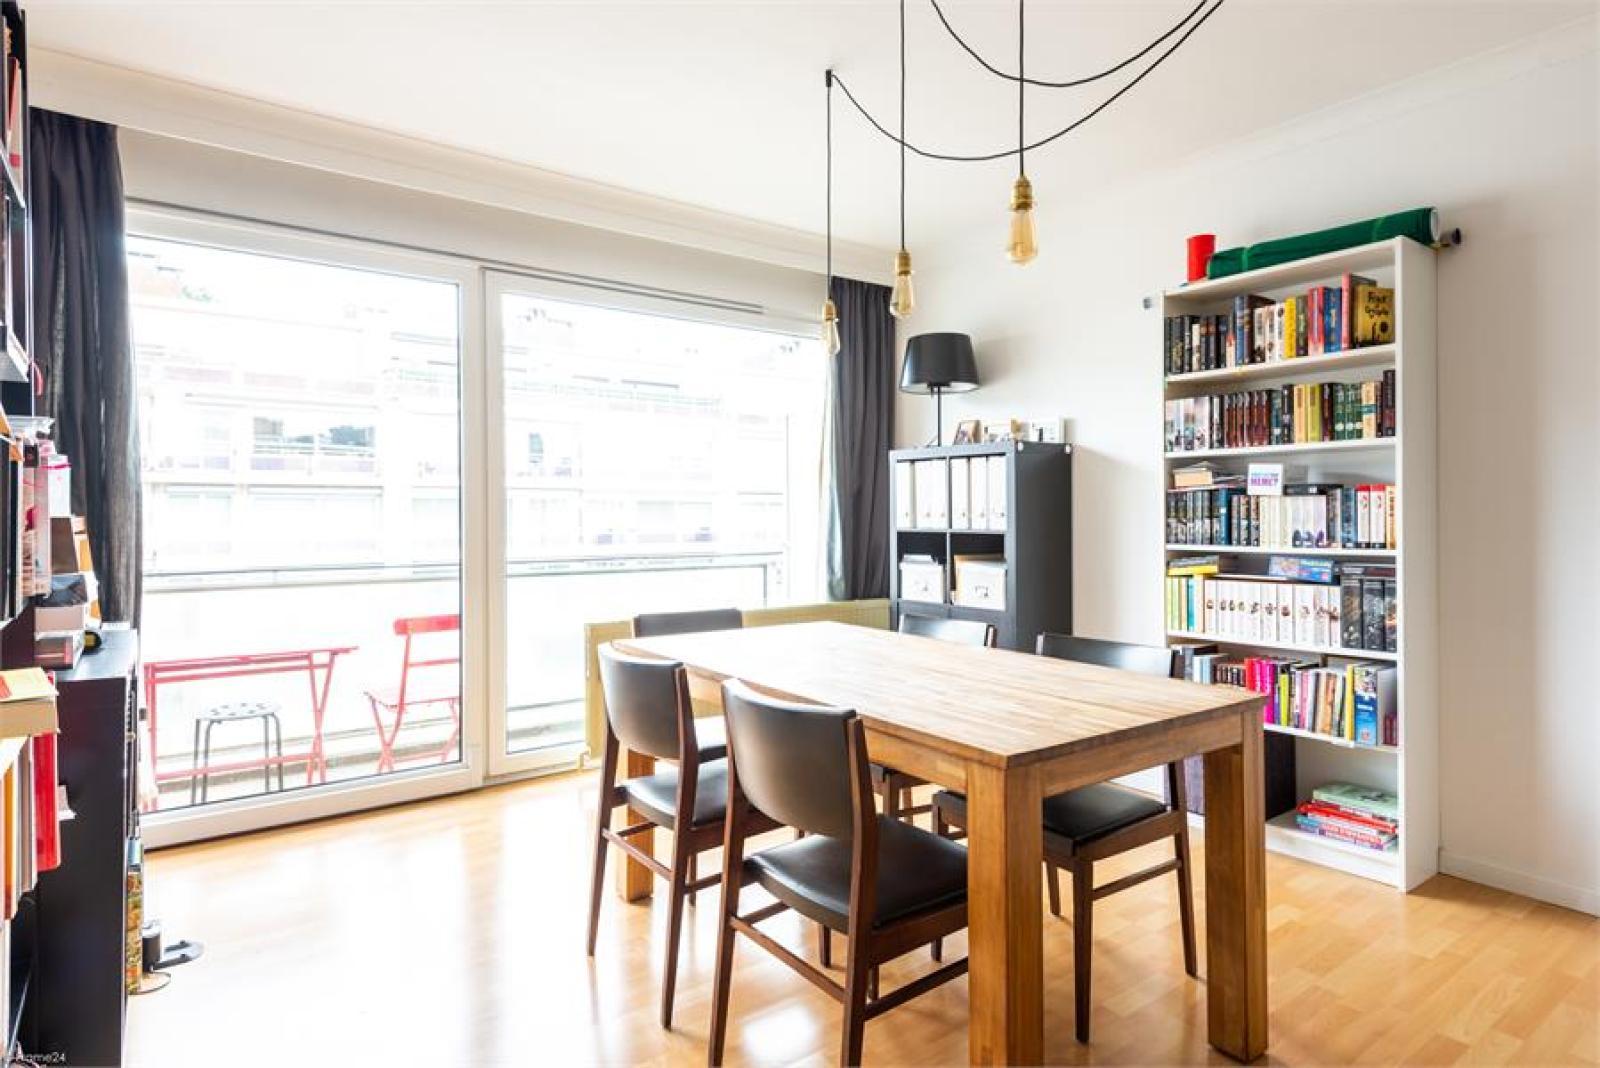 Instapklaar appartement (77 m²) met twee slaapkamers op centrale ligging te Deurne! afbeelding 2